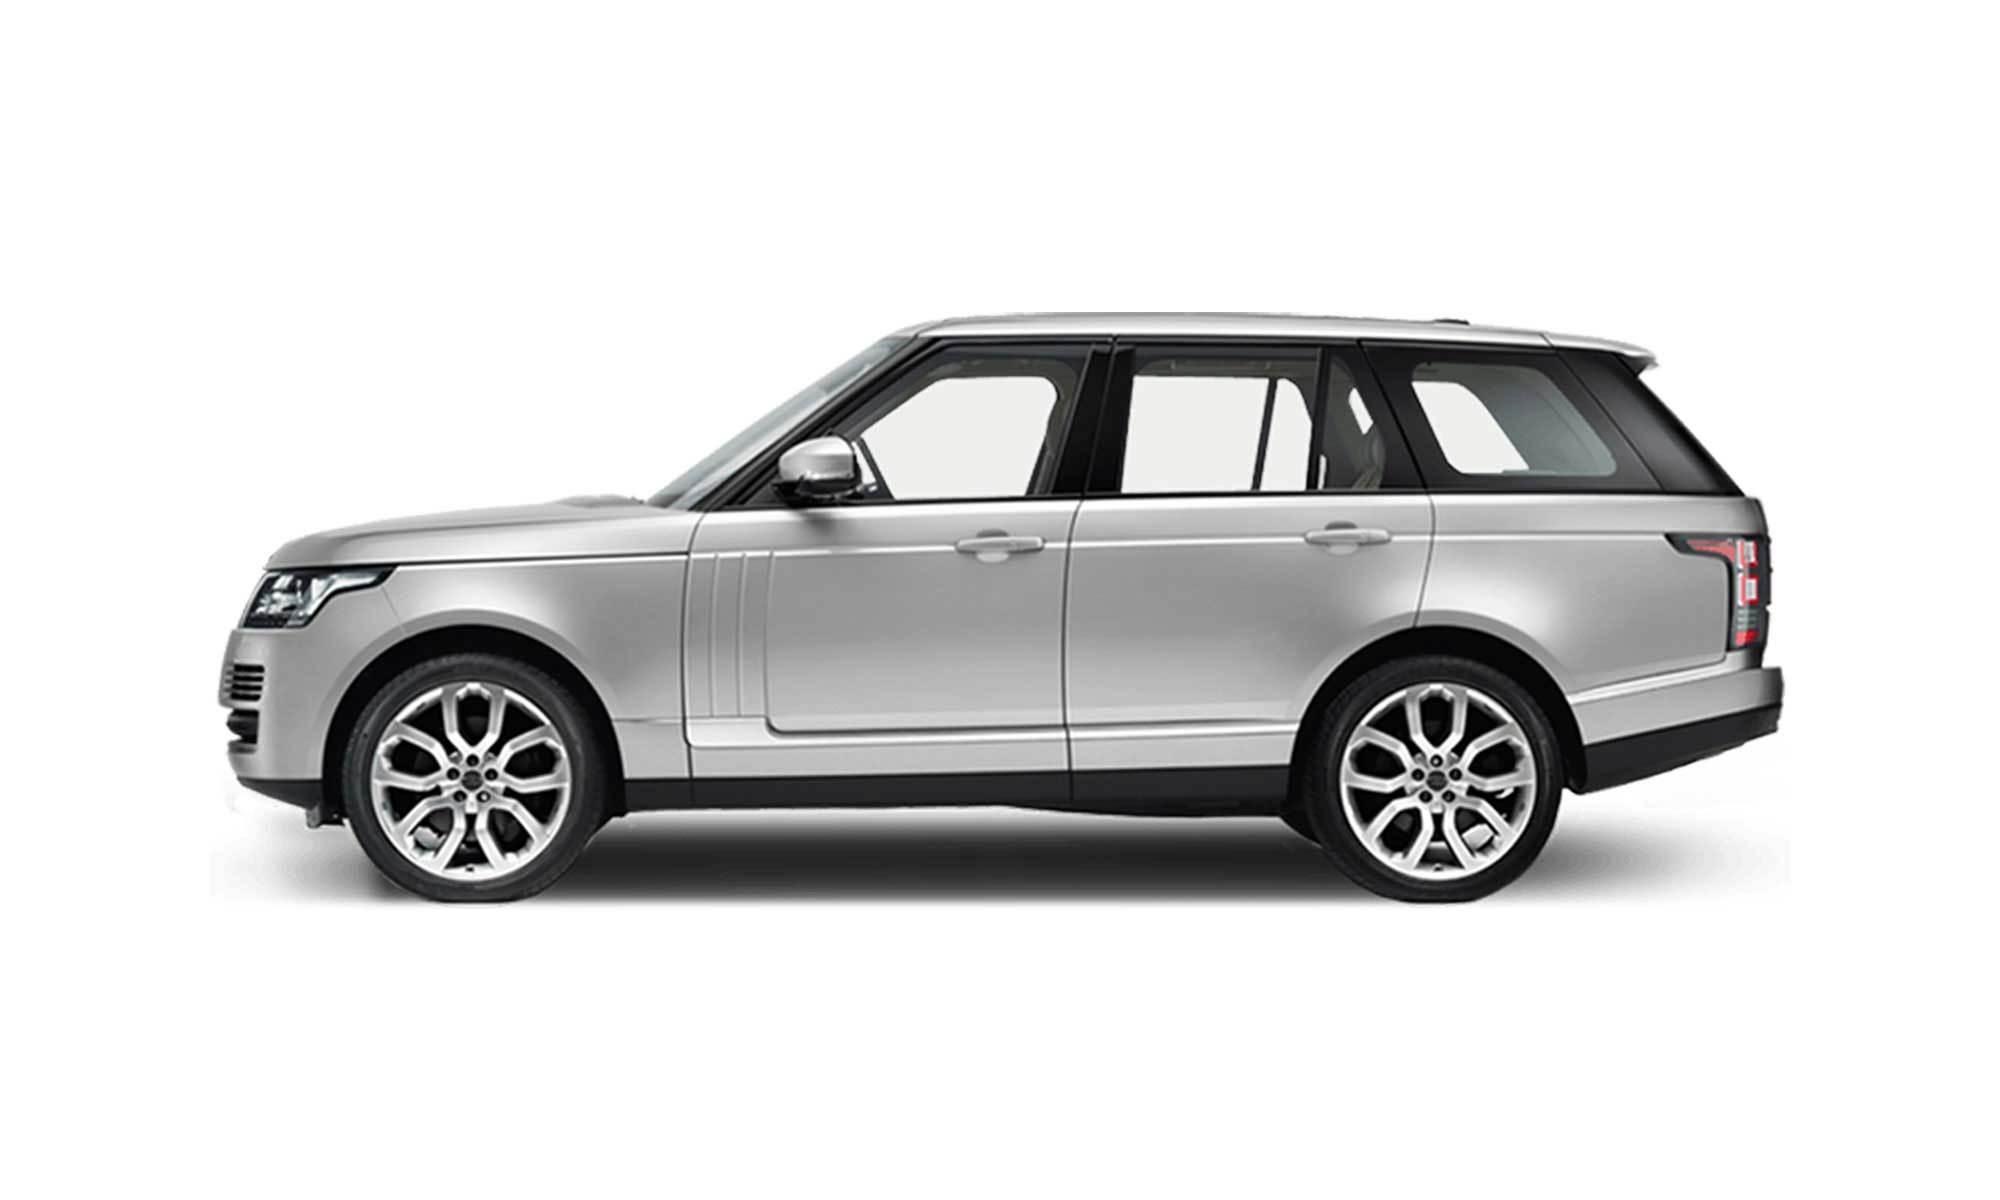 Range Rover White Background 2